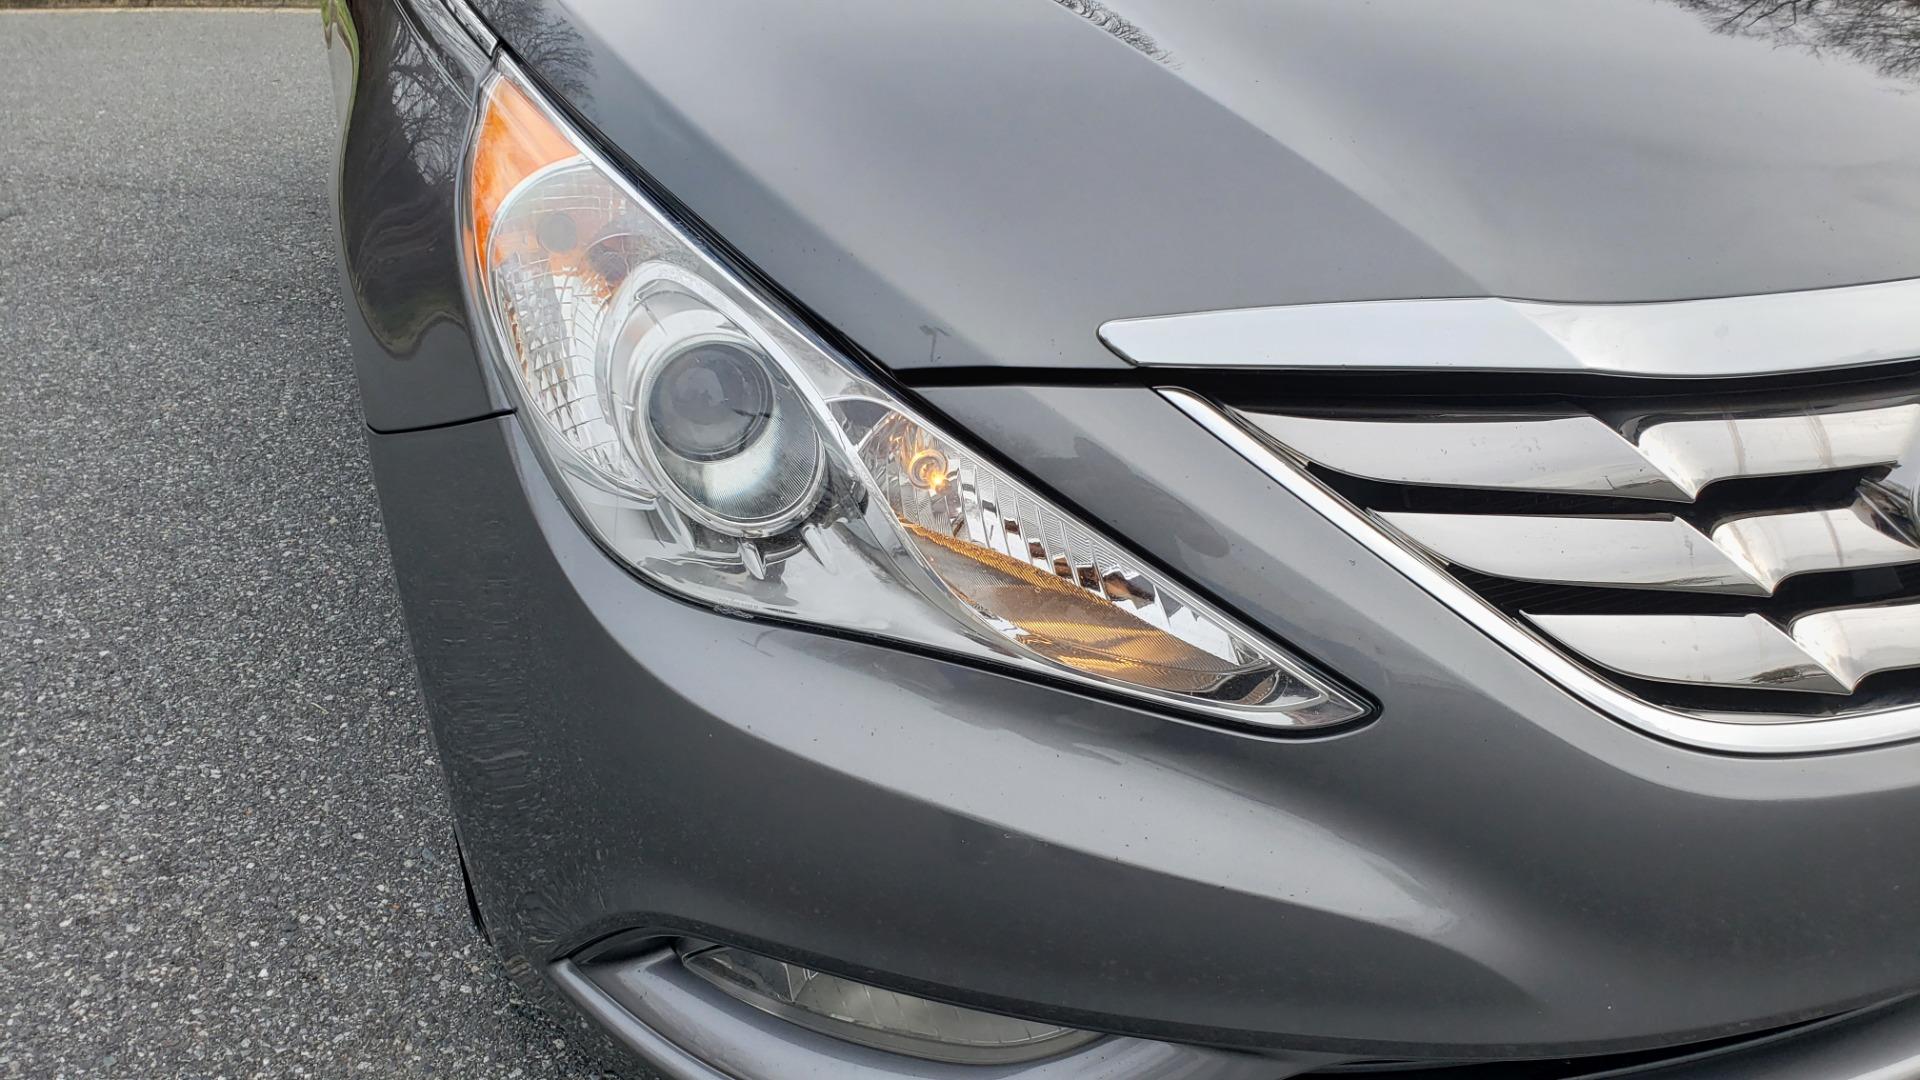 Used 2013 Hyundai SONATA SE AUTO / 2.4L 4-CYL / 6-SPD AUTO / VERY CLEAN for sale Sold at Formula Imports in Charlotte NC 28227 24